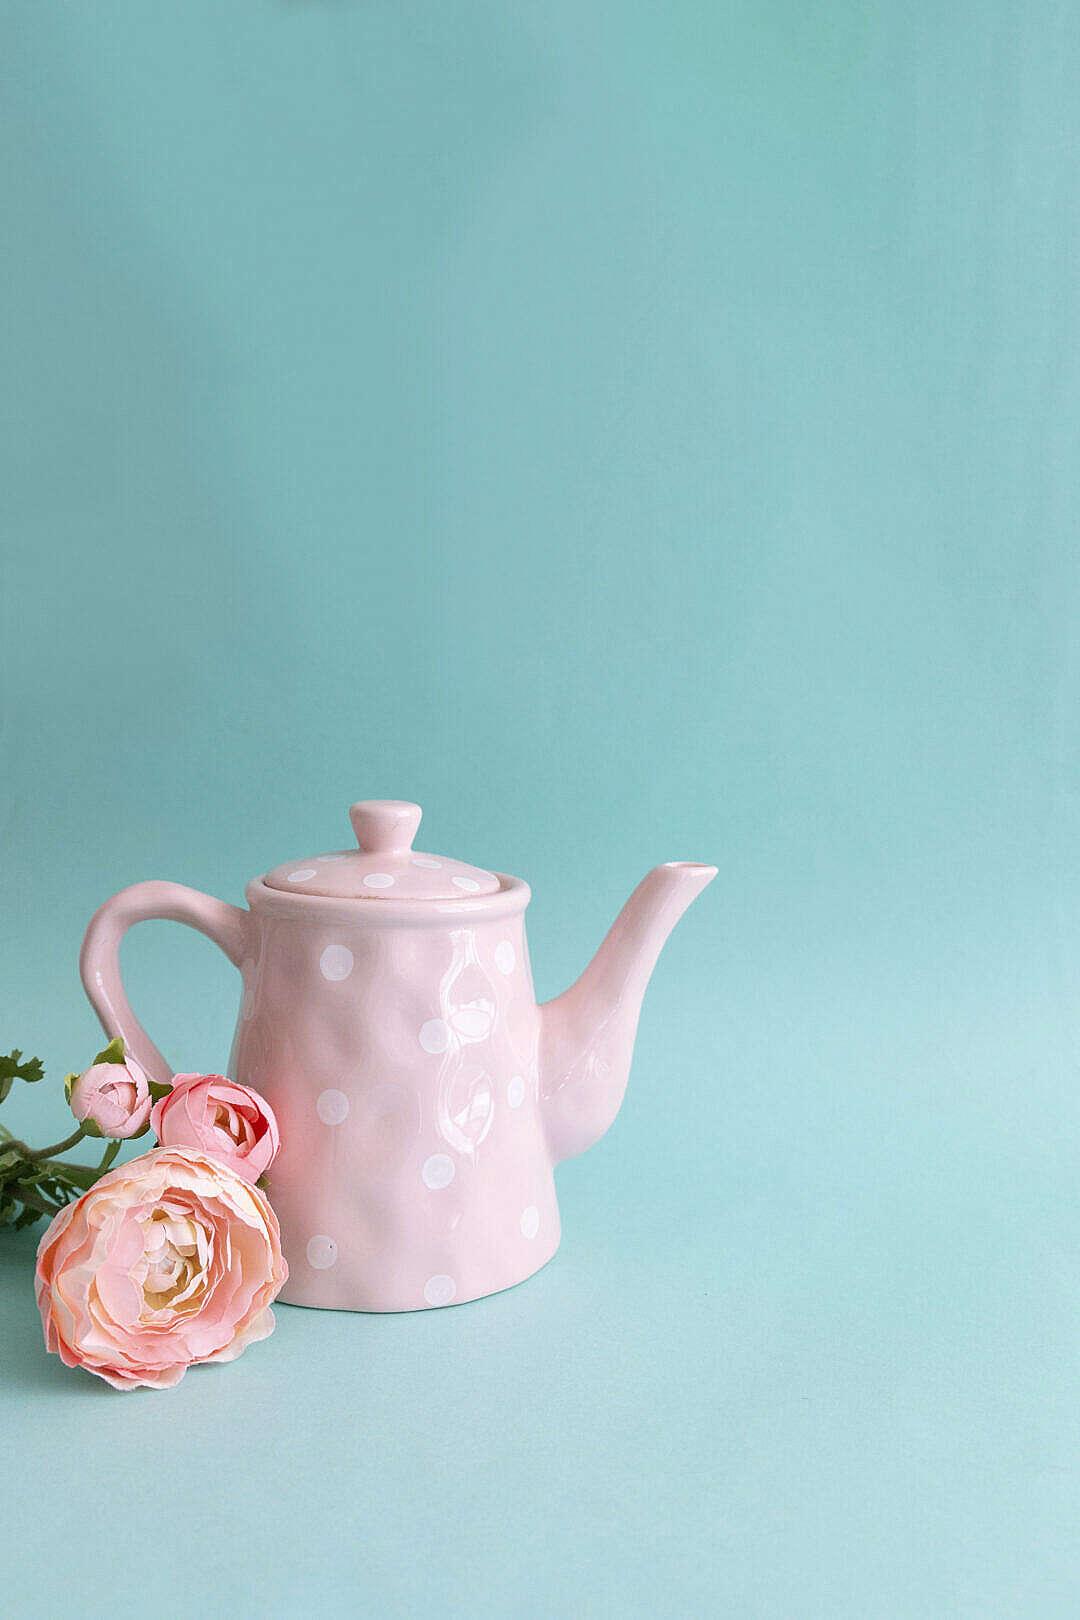 Download Colorful Vintage Teapot Tea Time FREE Stock Photo